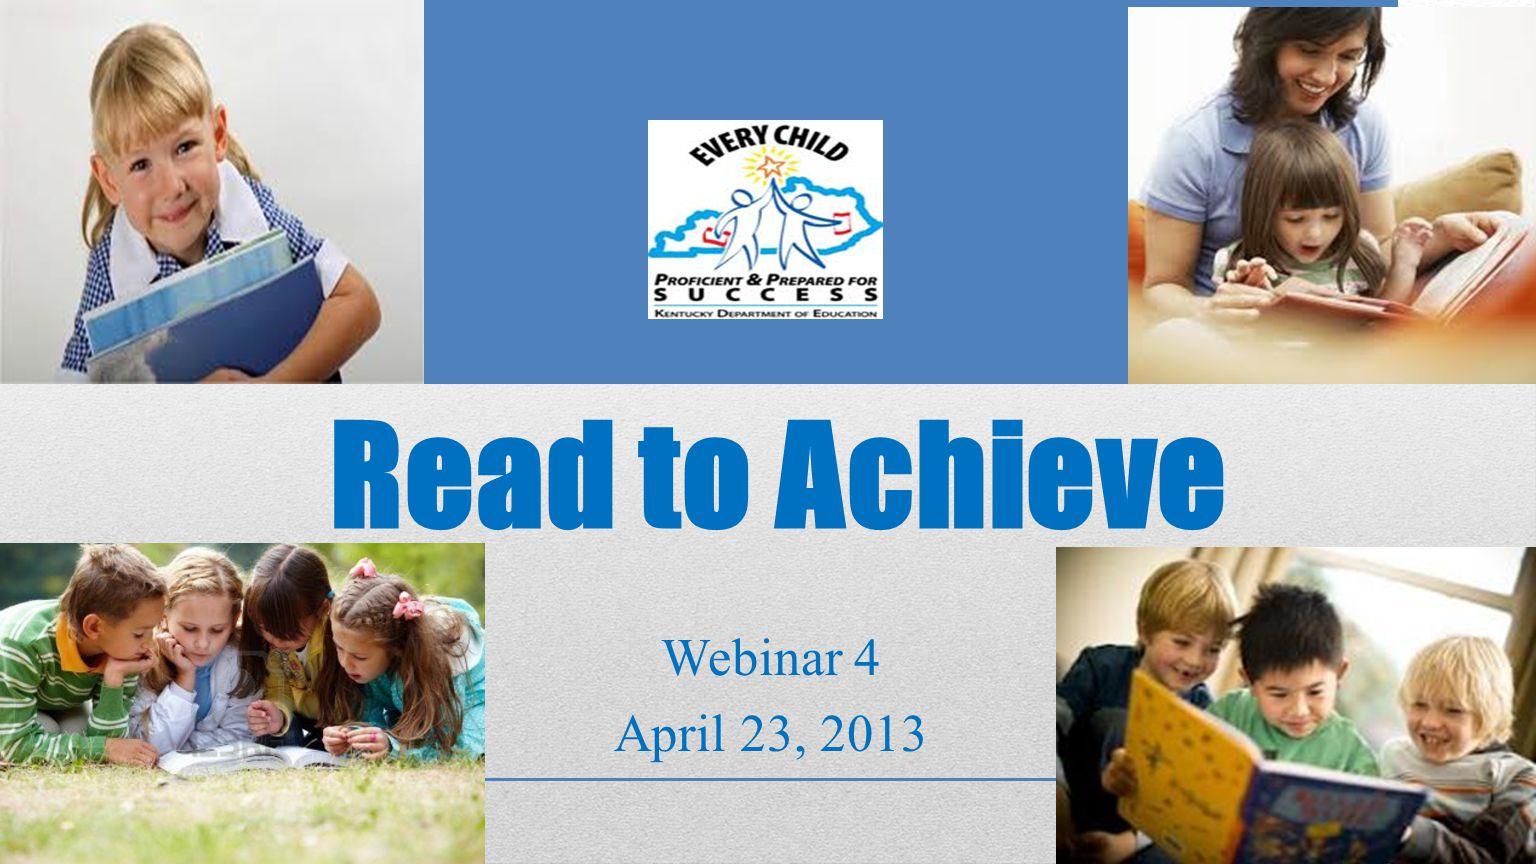 Read to Achieve Webinar 4 April 23, 2013